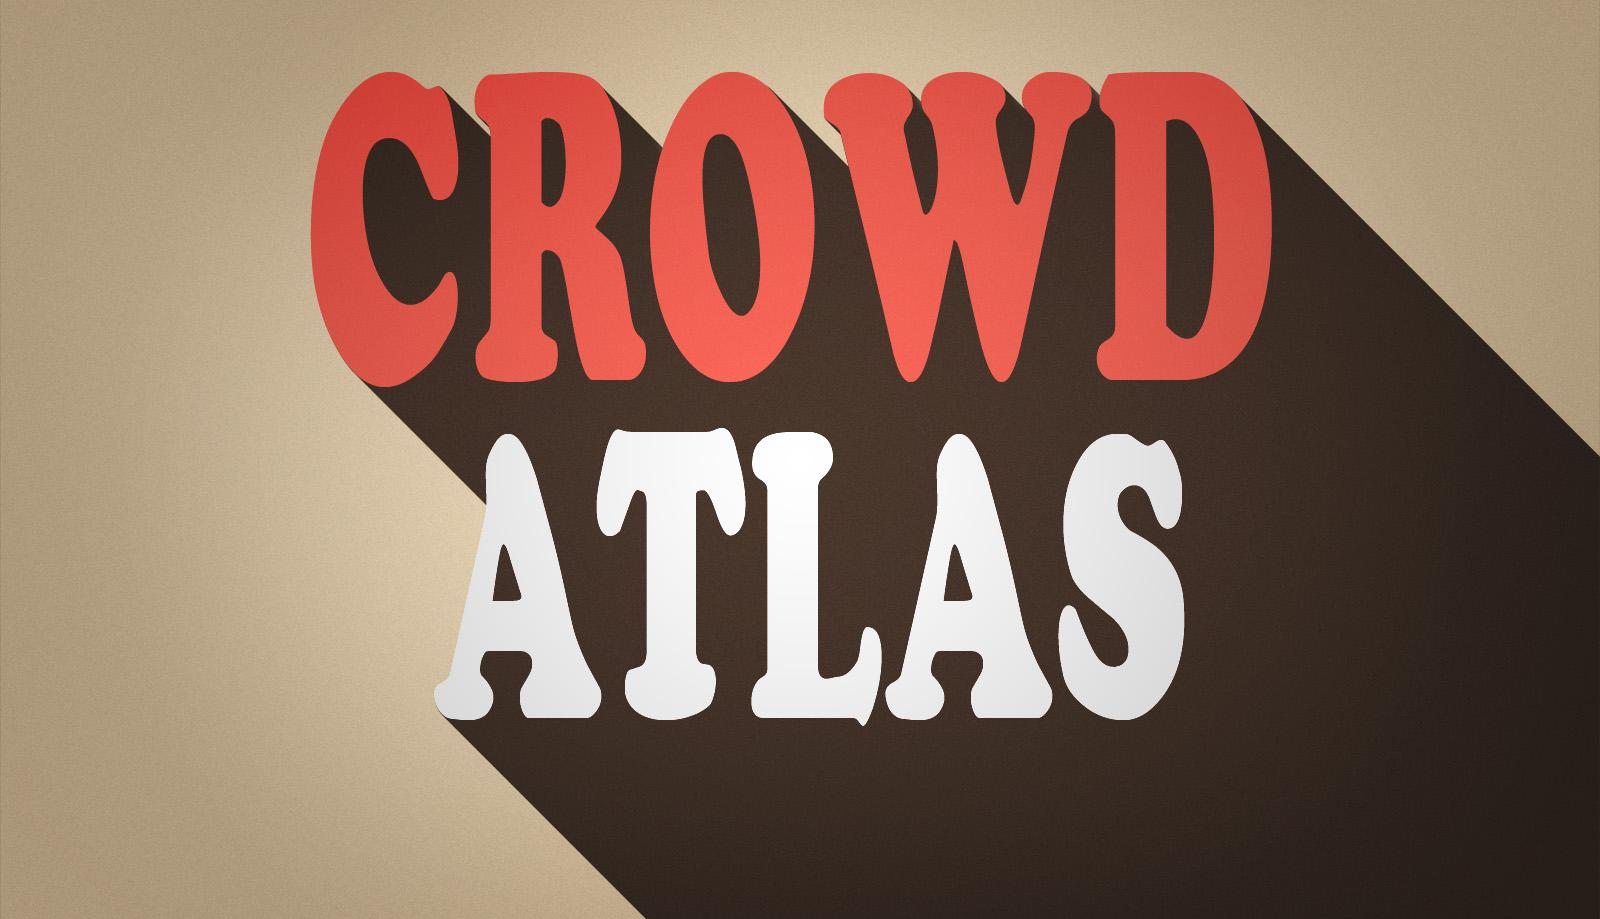 CrowdAtlasV3A